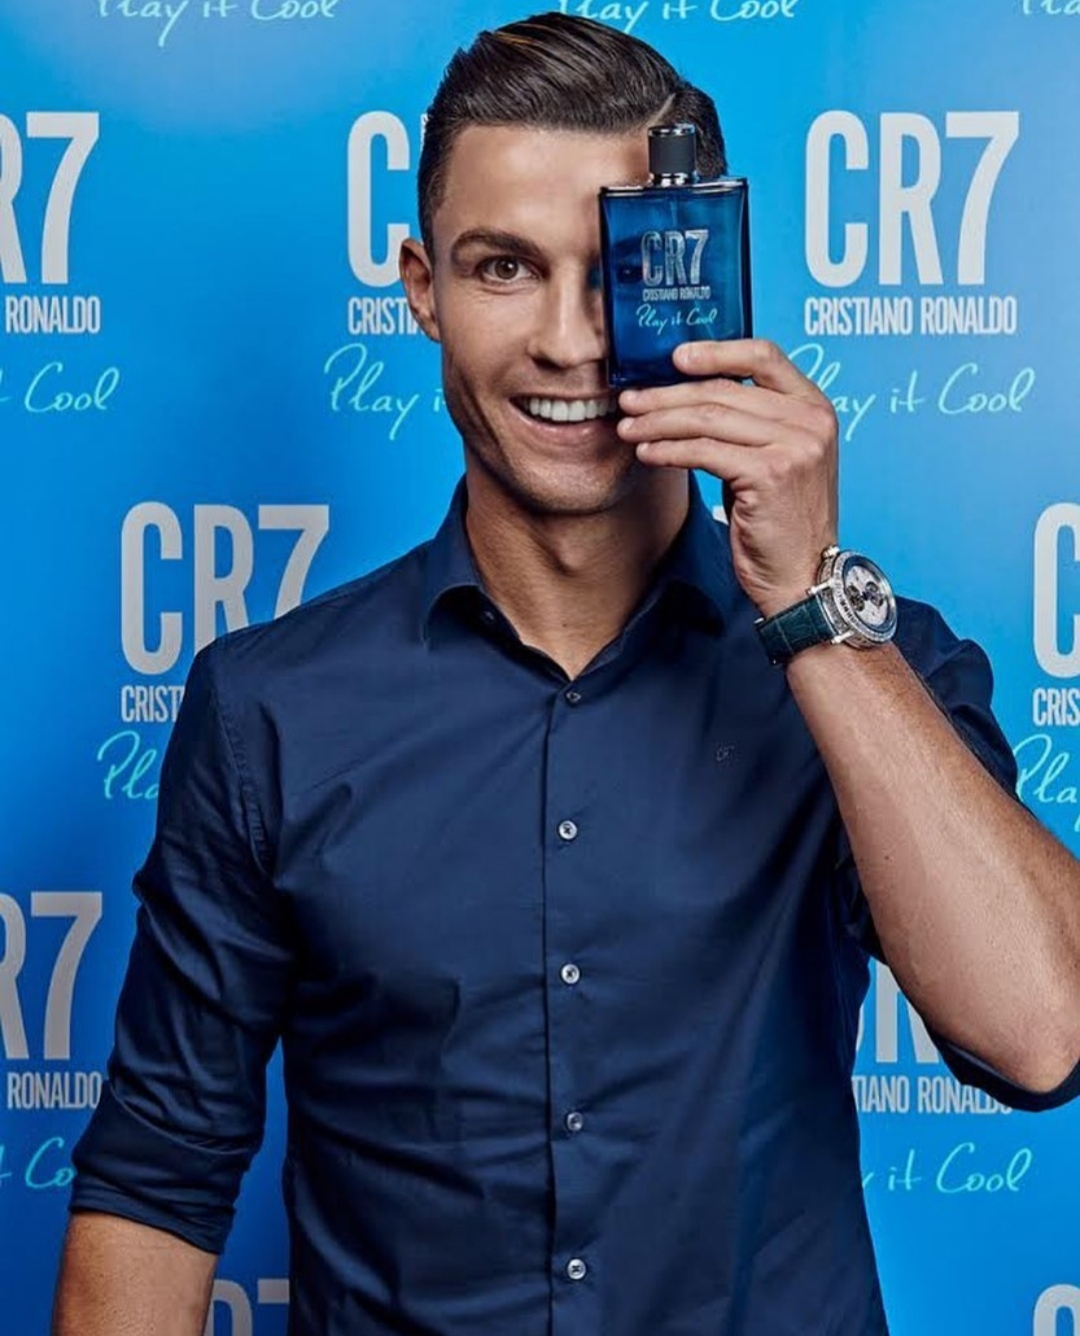 30+ Best Cristiano Ronaldo Photos 2020 | Cristiano Ronaldo Photos HD | Cristiano Ronaldo Image Free Download